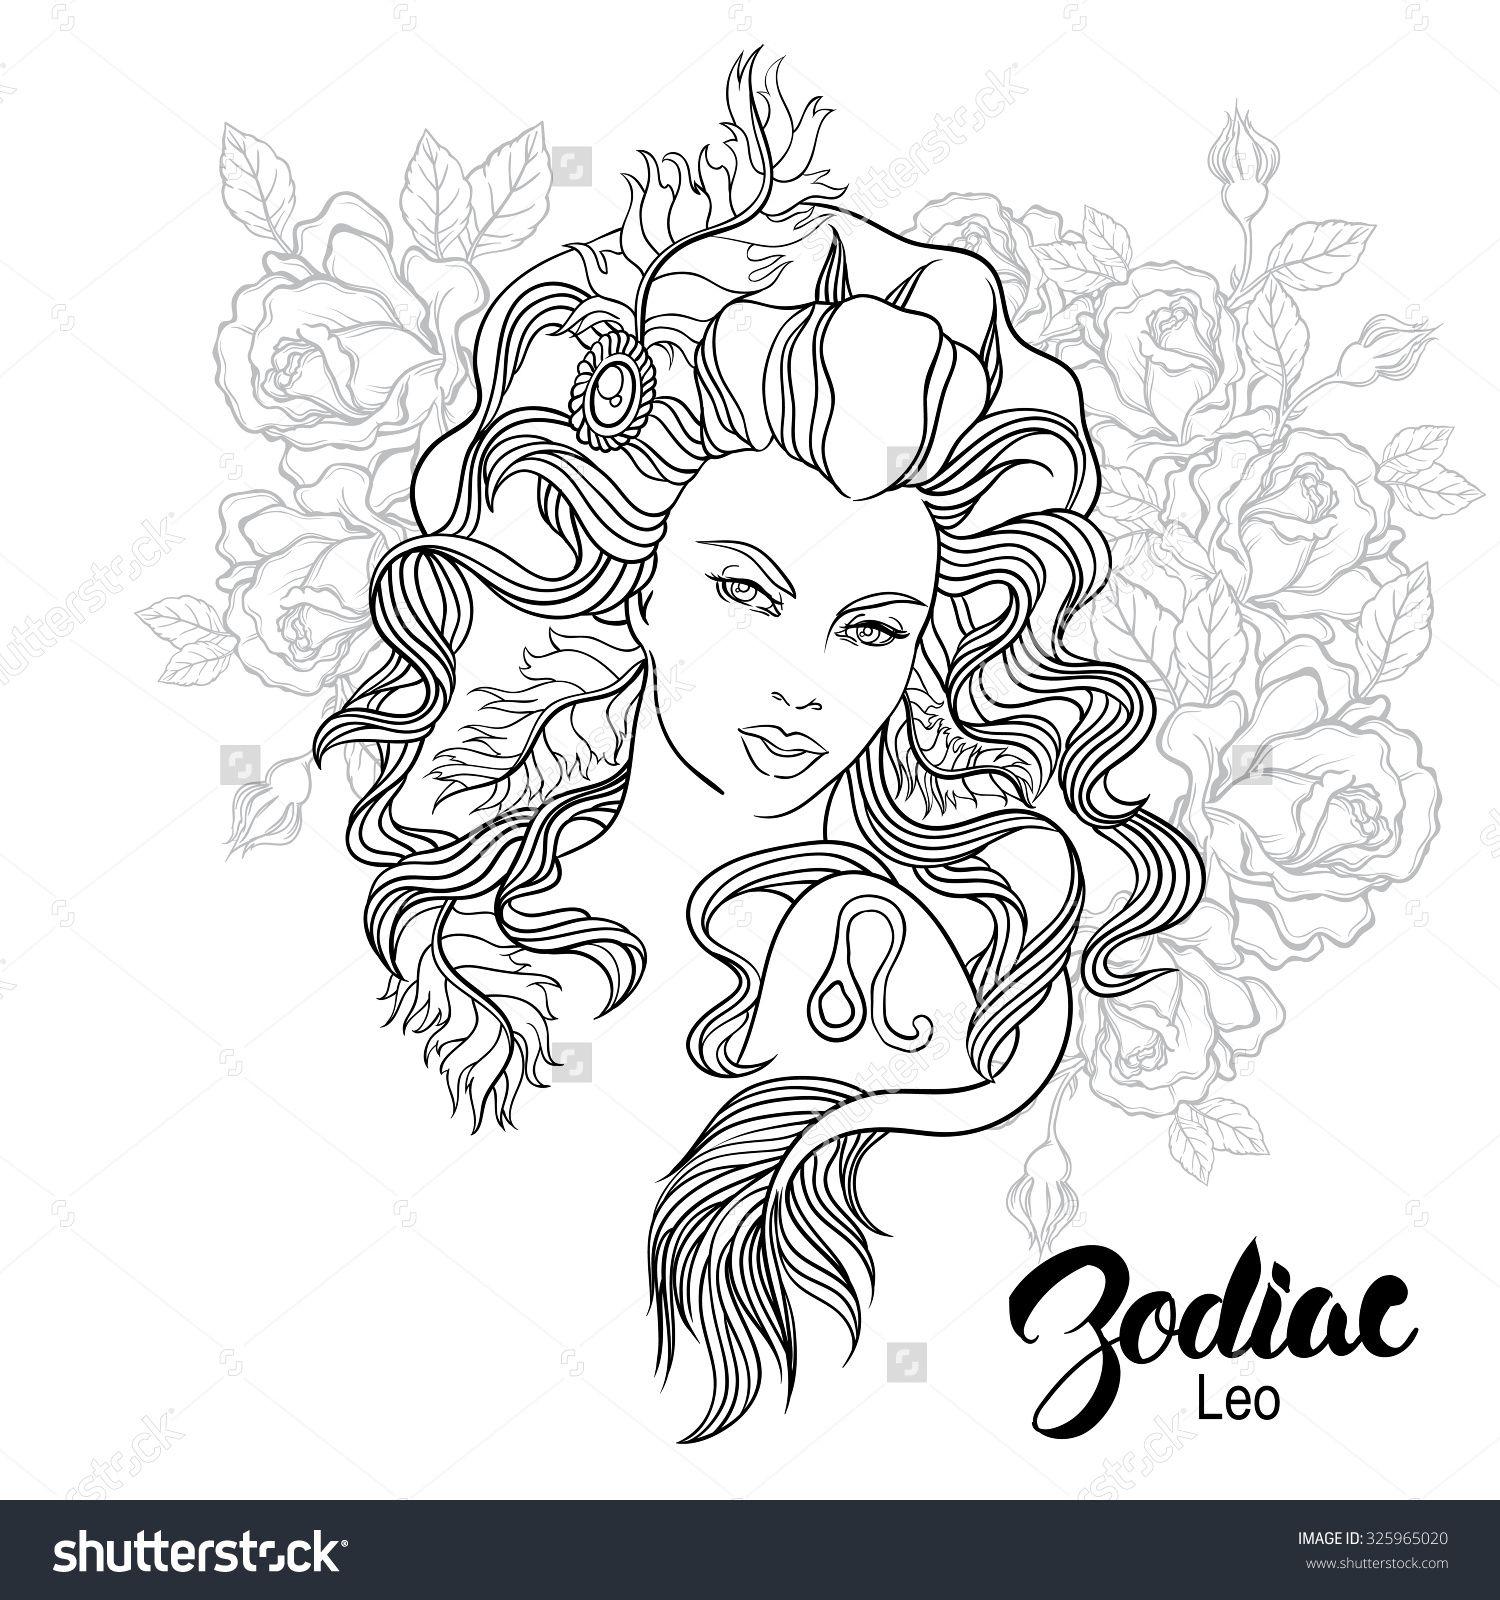 Zodiac Leo Girl Coloring Page Shutterstock 325965020 Knizhka